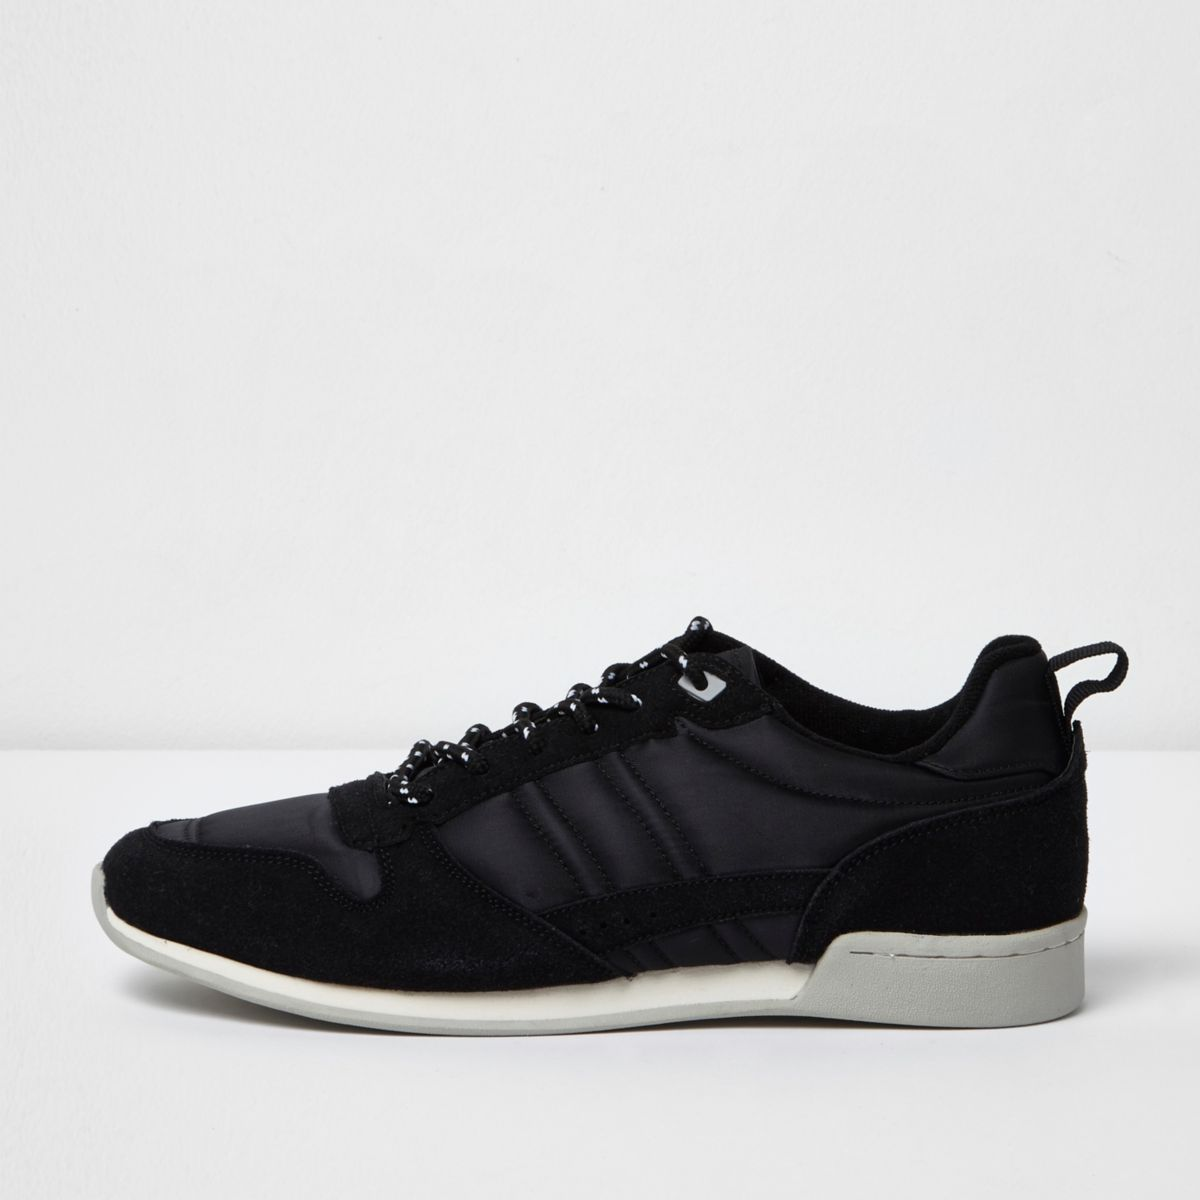 Black retro runner sneakers